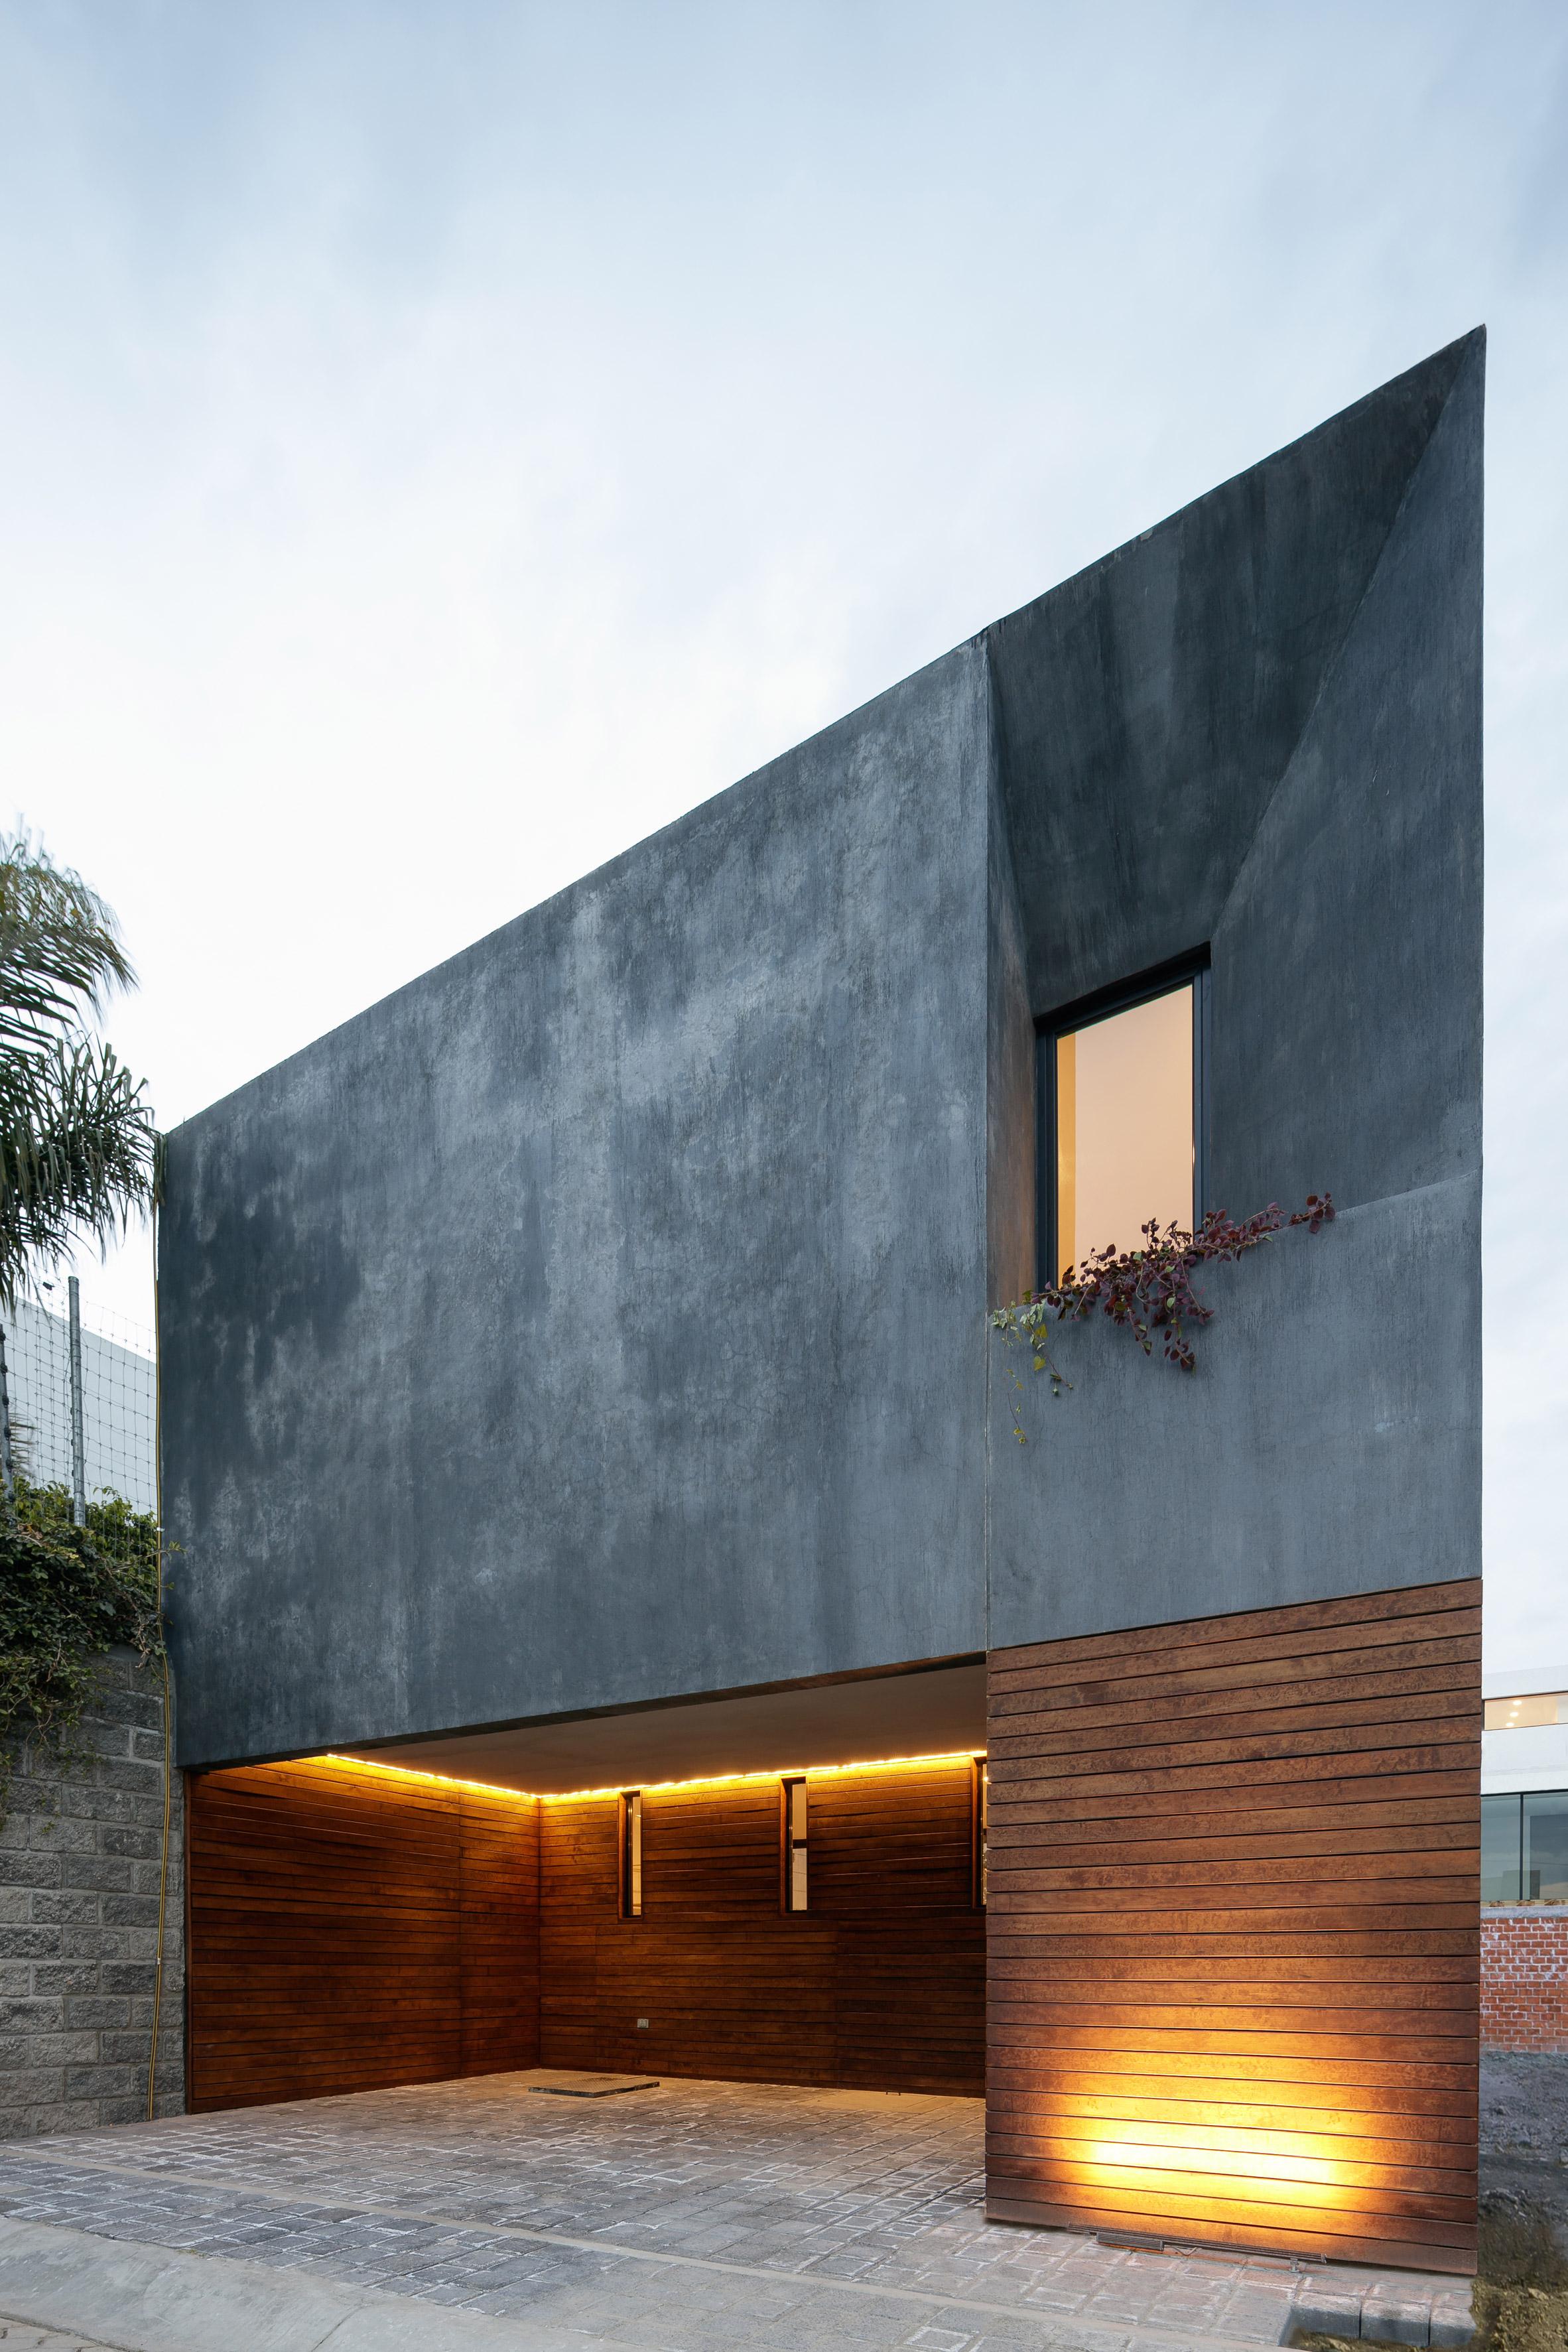 3novices espacio 18 squeezes grey townhouse onto tight for Espacio casa online